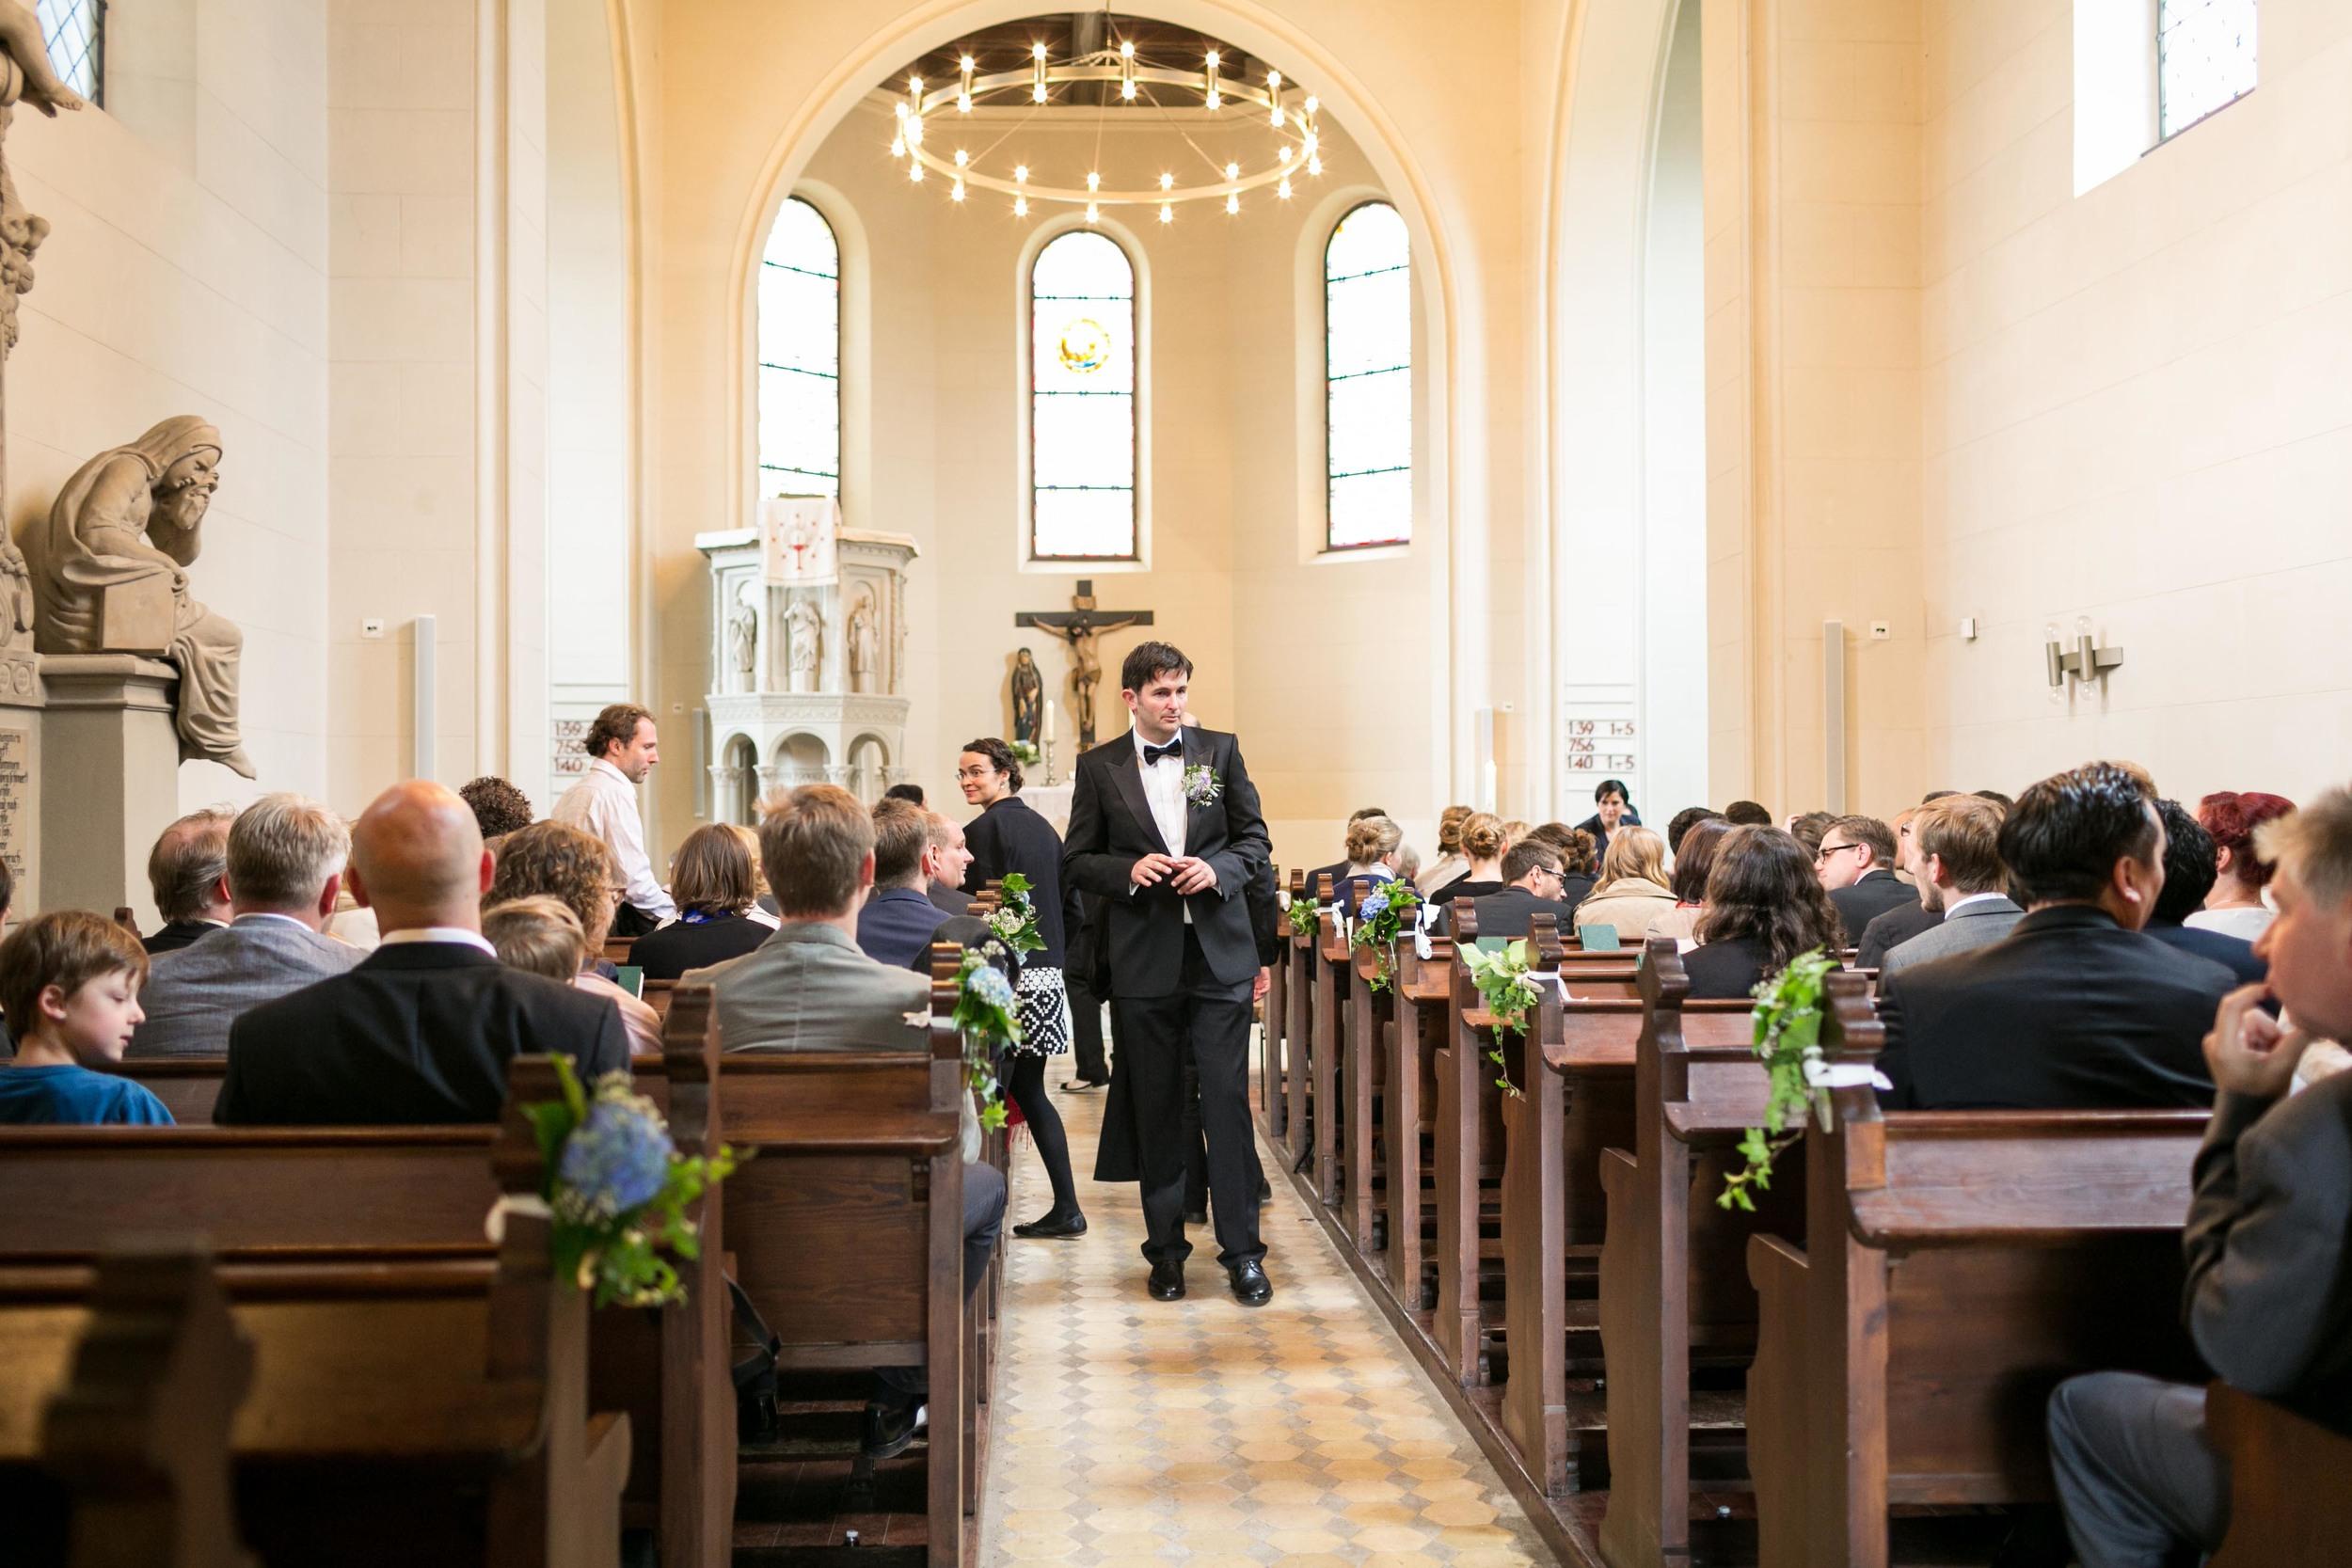 Hochzeitsfotografie Berlin_Fran Burrows Fotografie_5.jpg